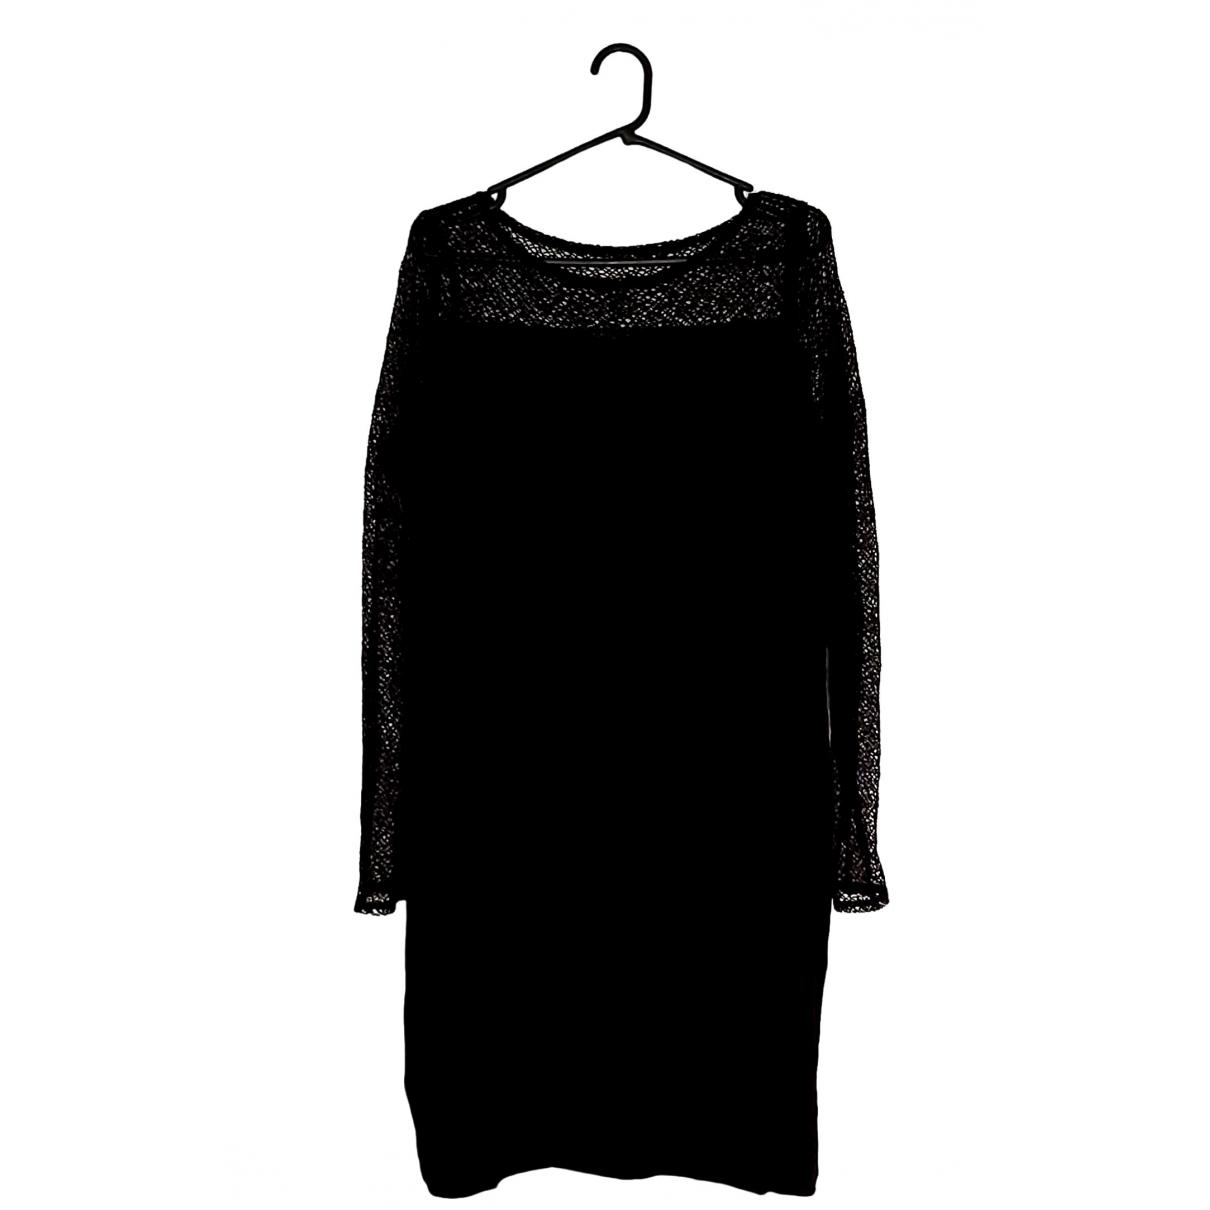 Eileen Fisher \N Black Cotton - elasthane dress for Women L International